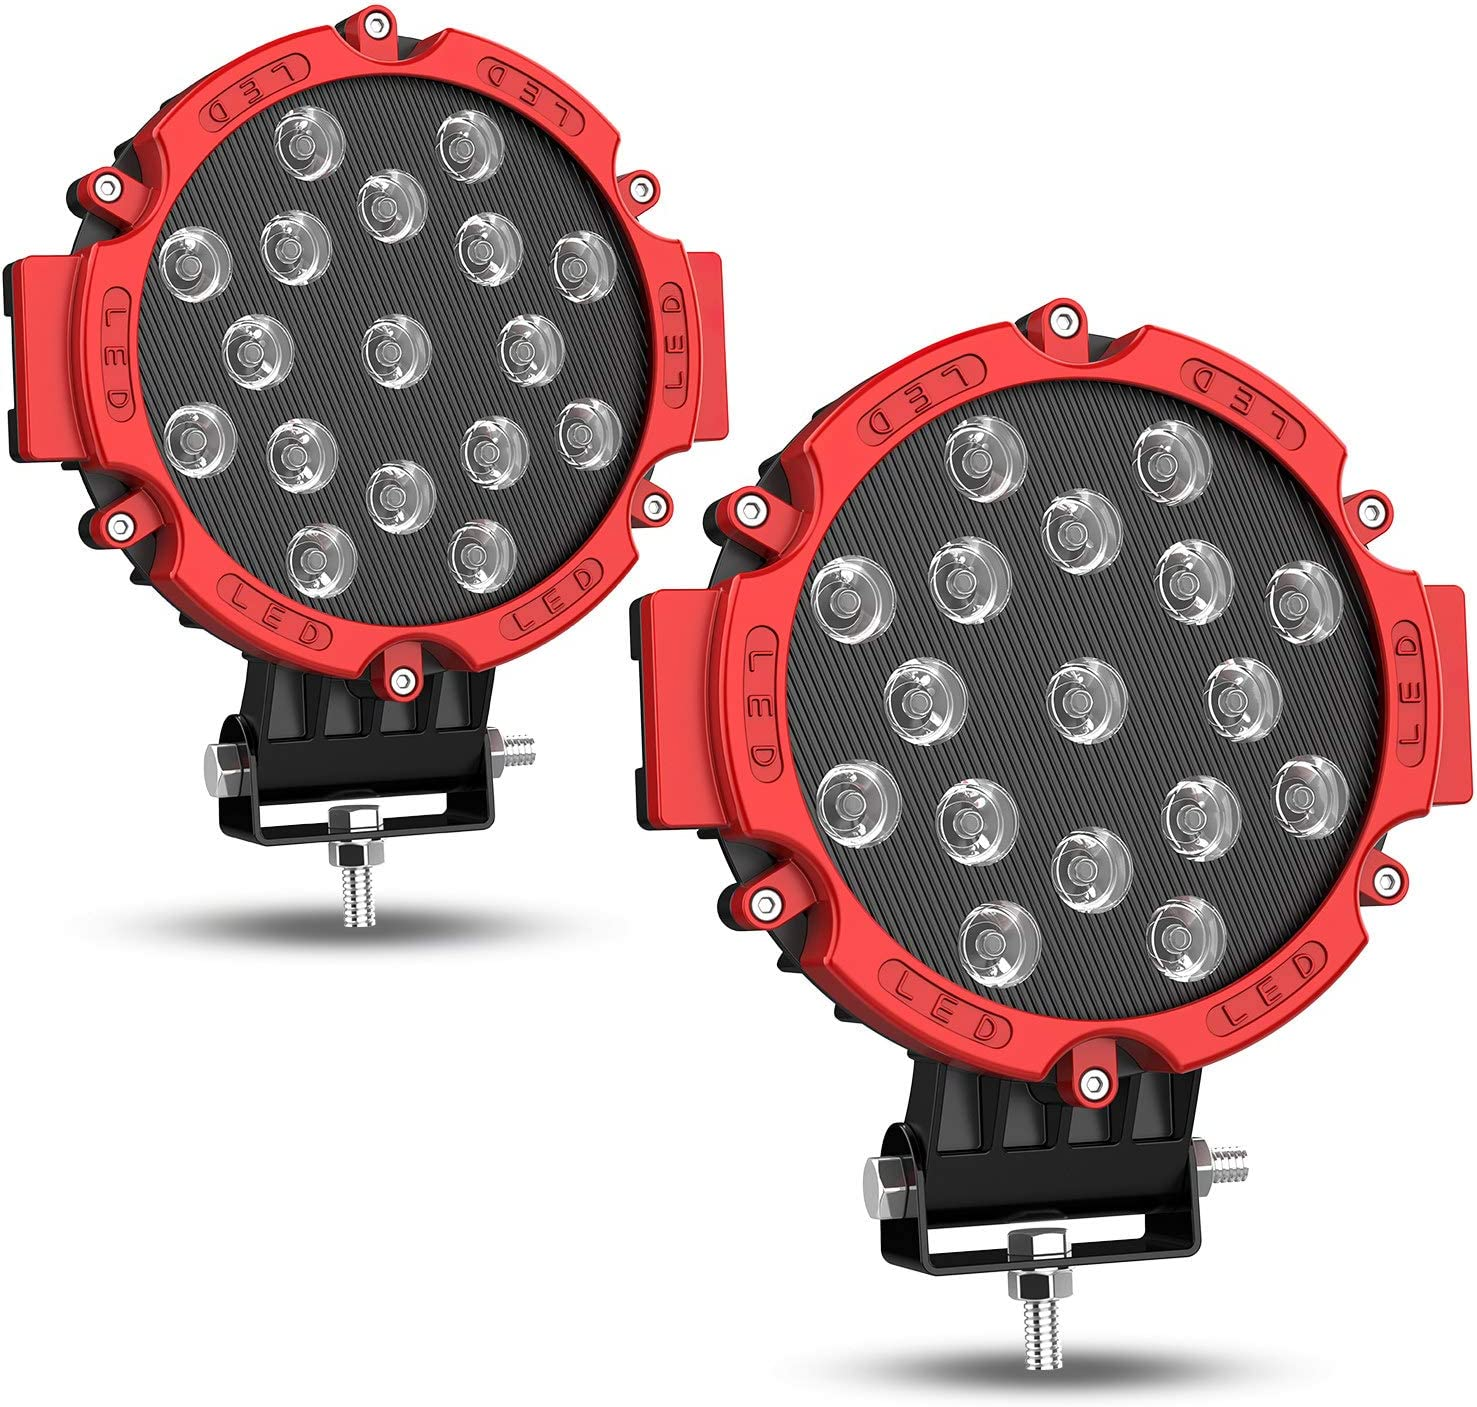 AutoSaver88 LED Offroad Pod Lights